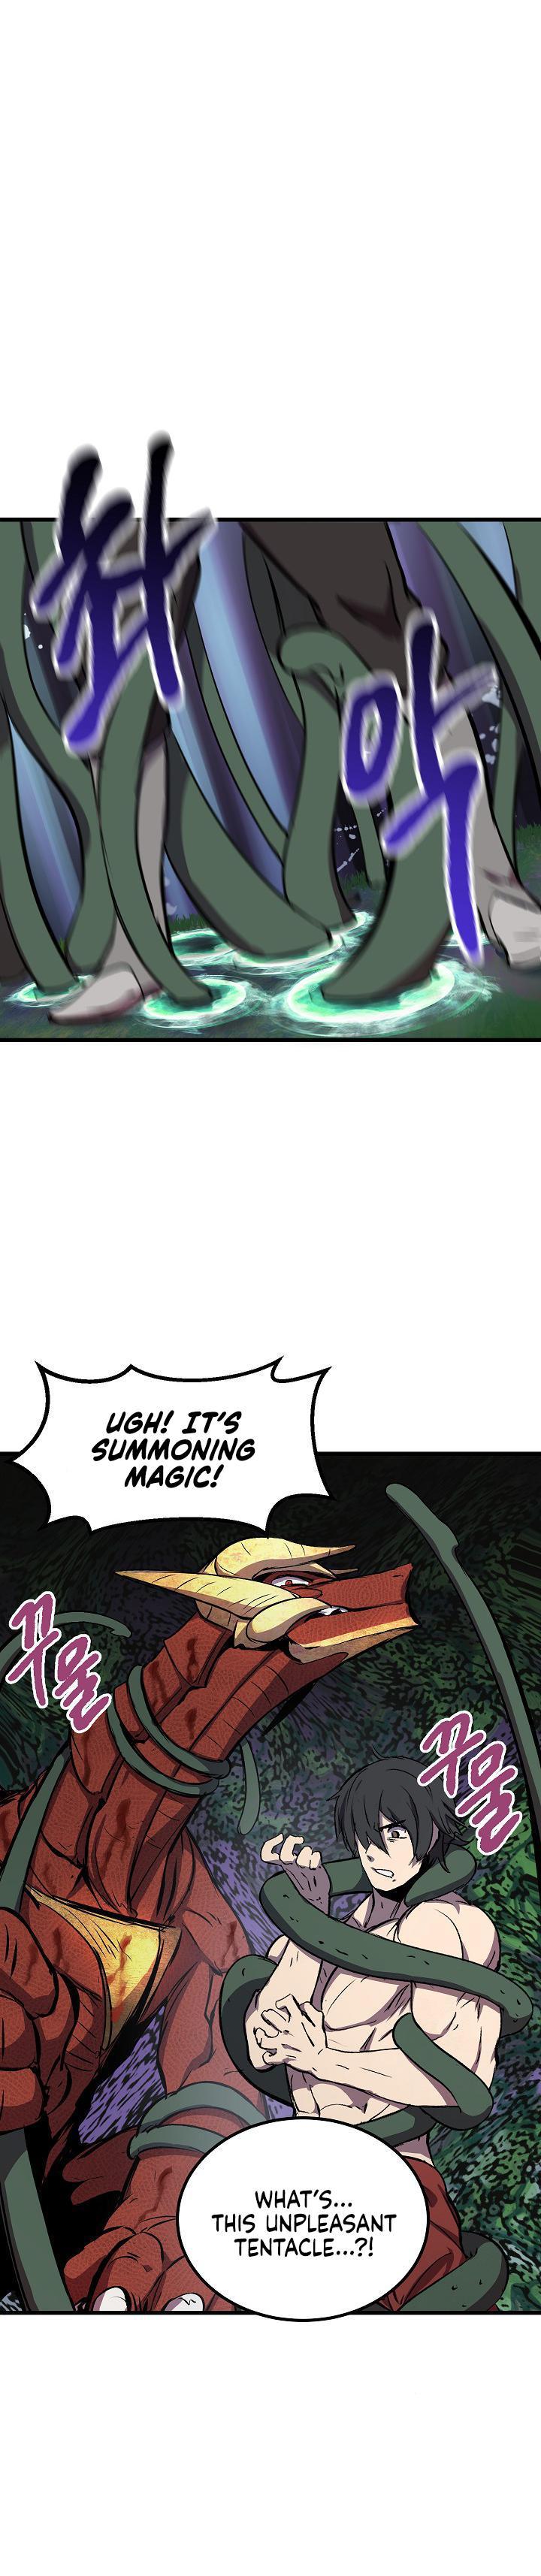 Survival Story Of A Sword King In A Fantasy World Vol.1 Chapter 19 page 33 - Mangakakalots.com